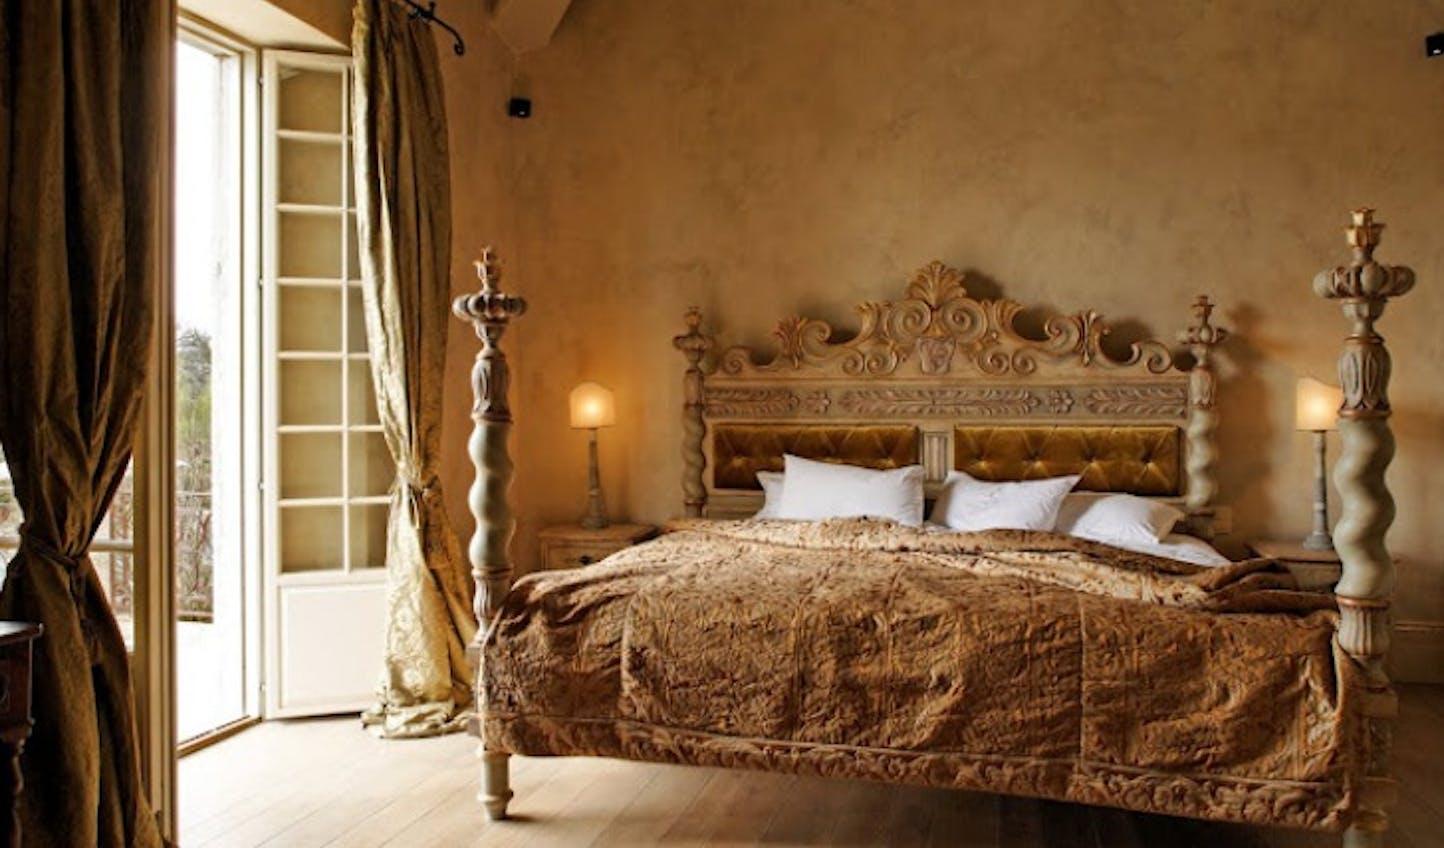 Classic Italian style adorns each room at Borgo Santo Pietro